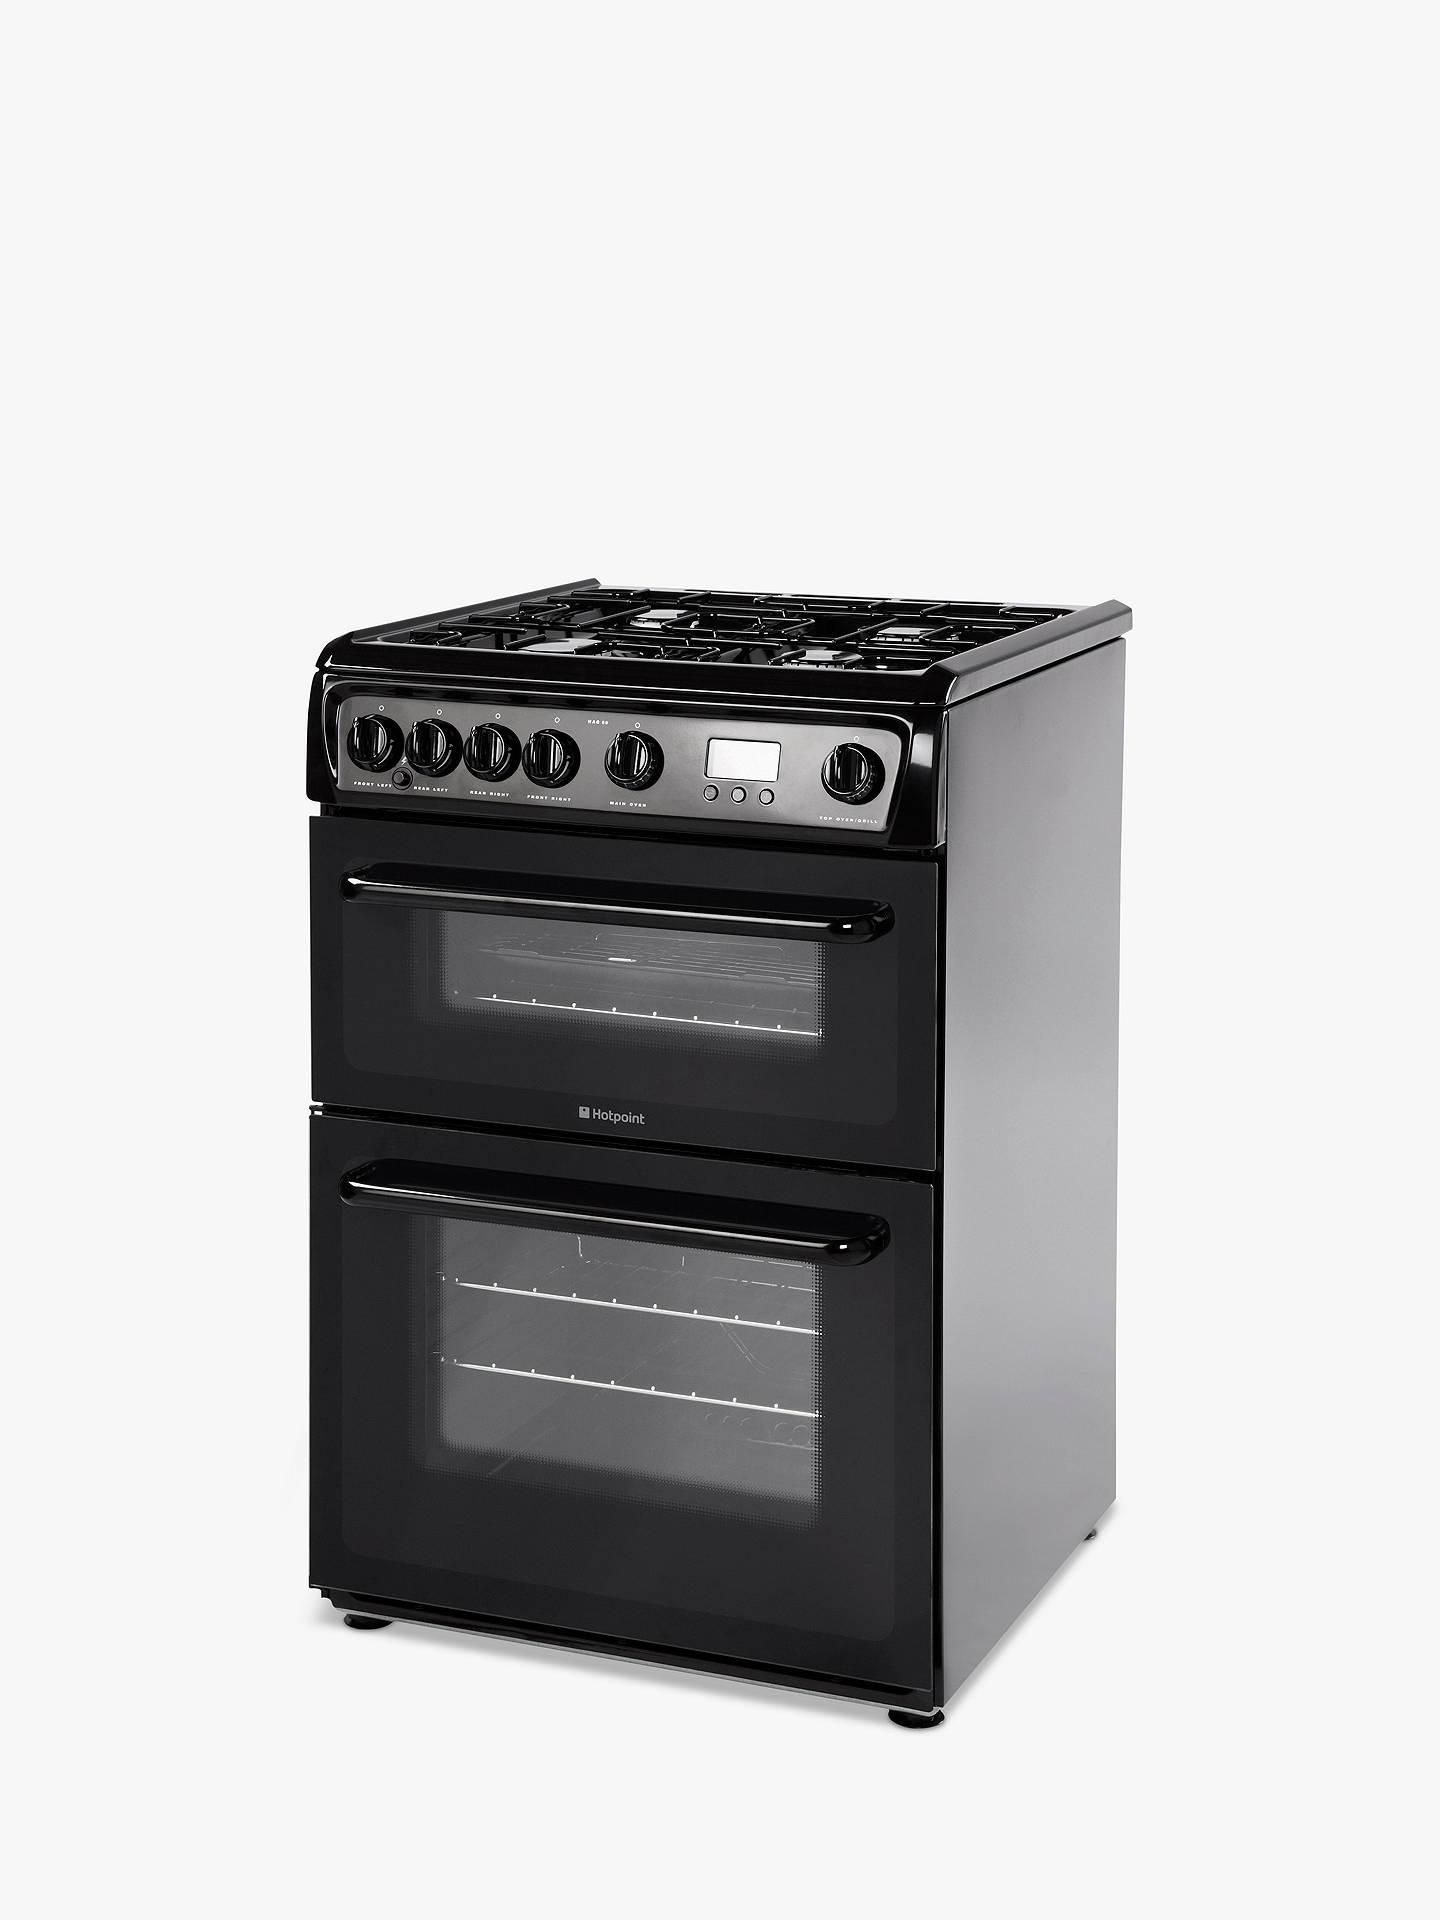 hotpoint newstyle hag60k gas cooker onyx black at john. Black Bedroom Furniture Sets. Home Design Ideas